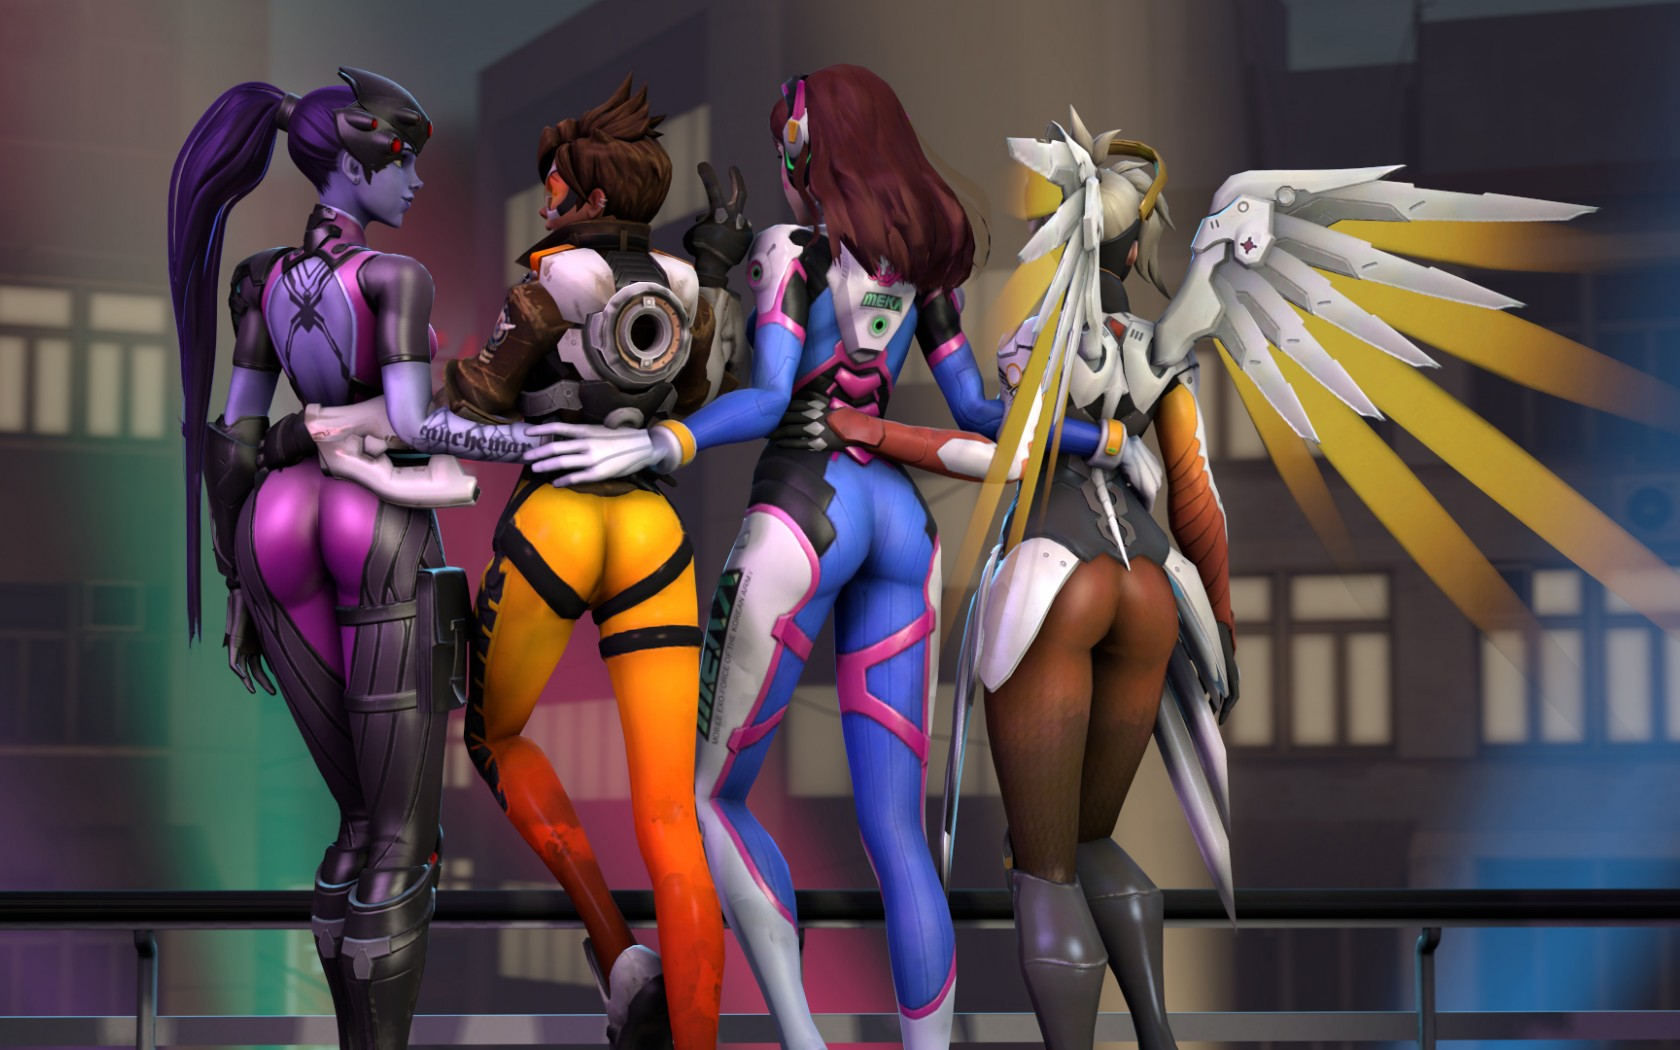 overwatch-sexy-girls-character-wallpapers.jpg